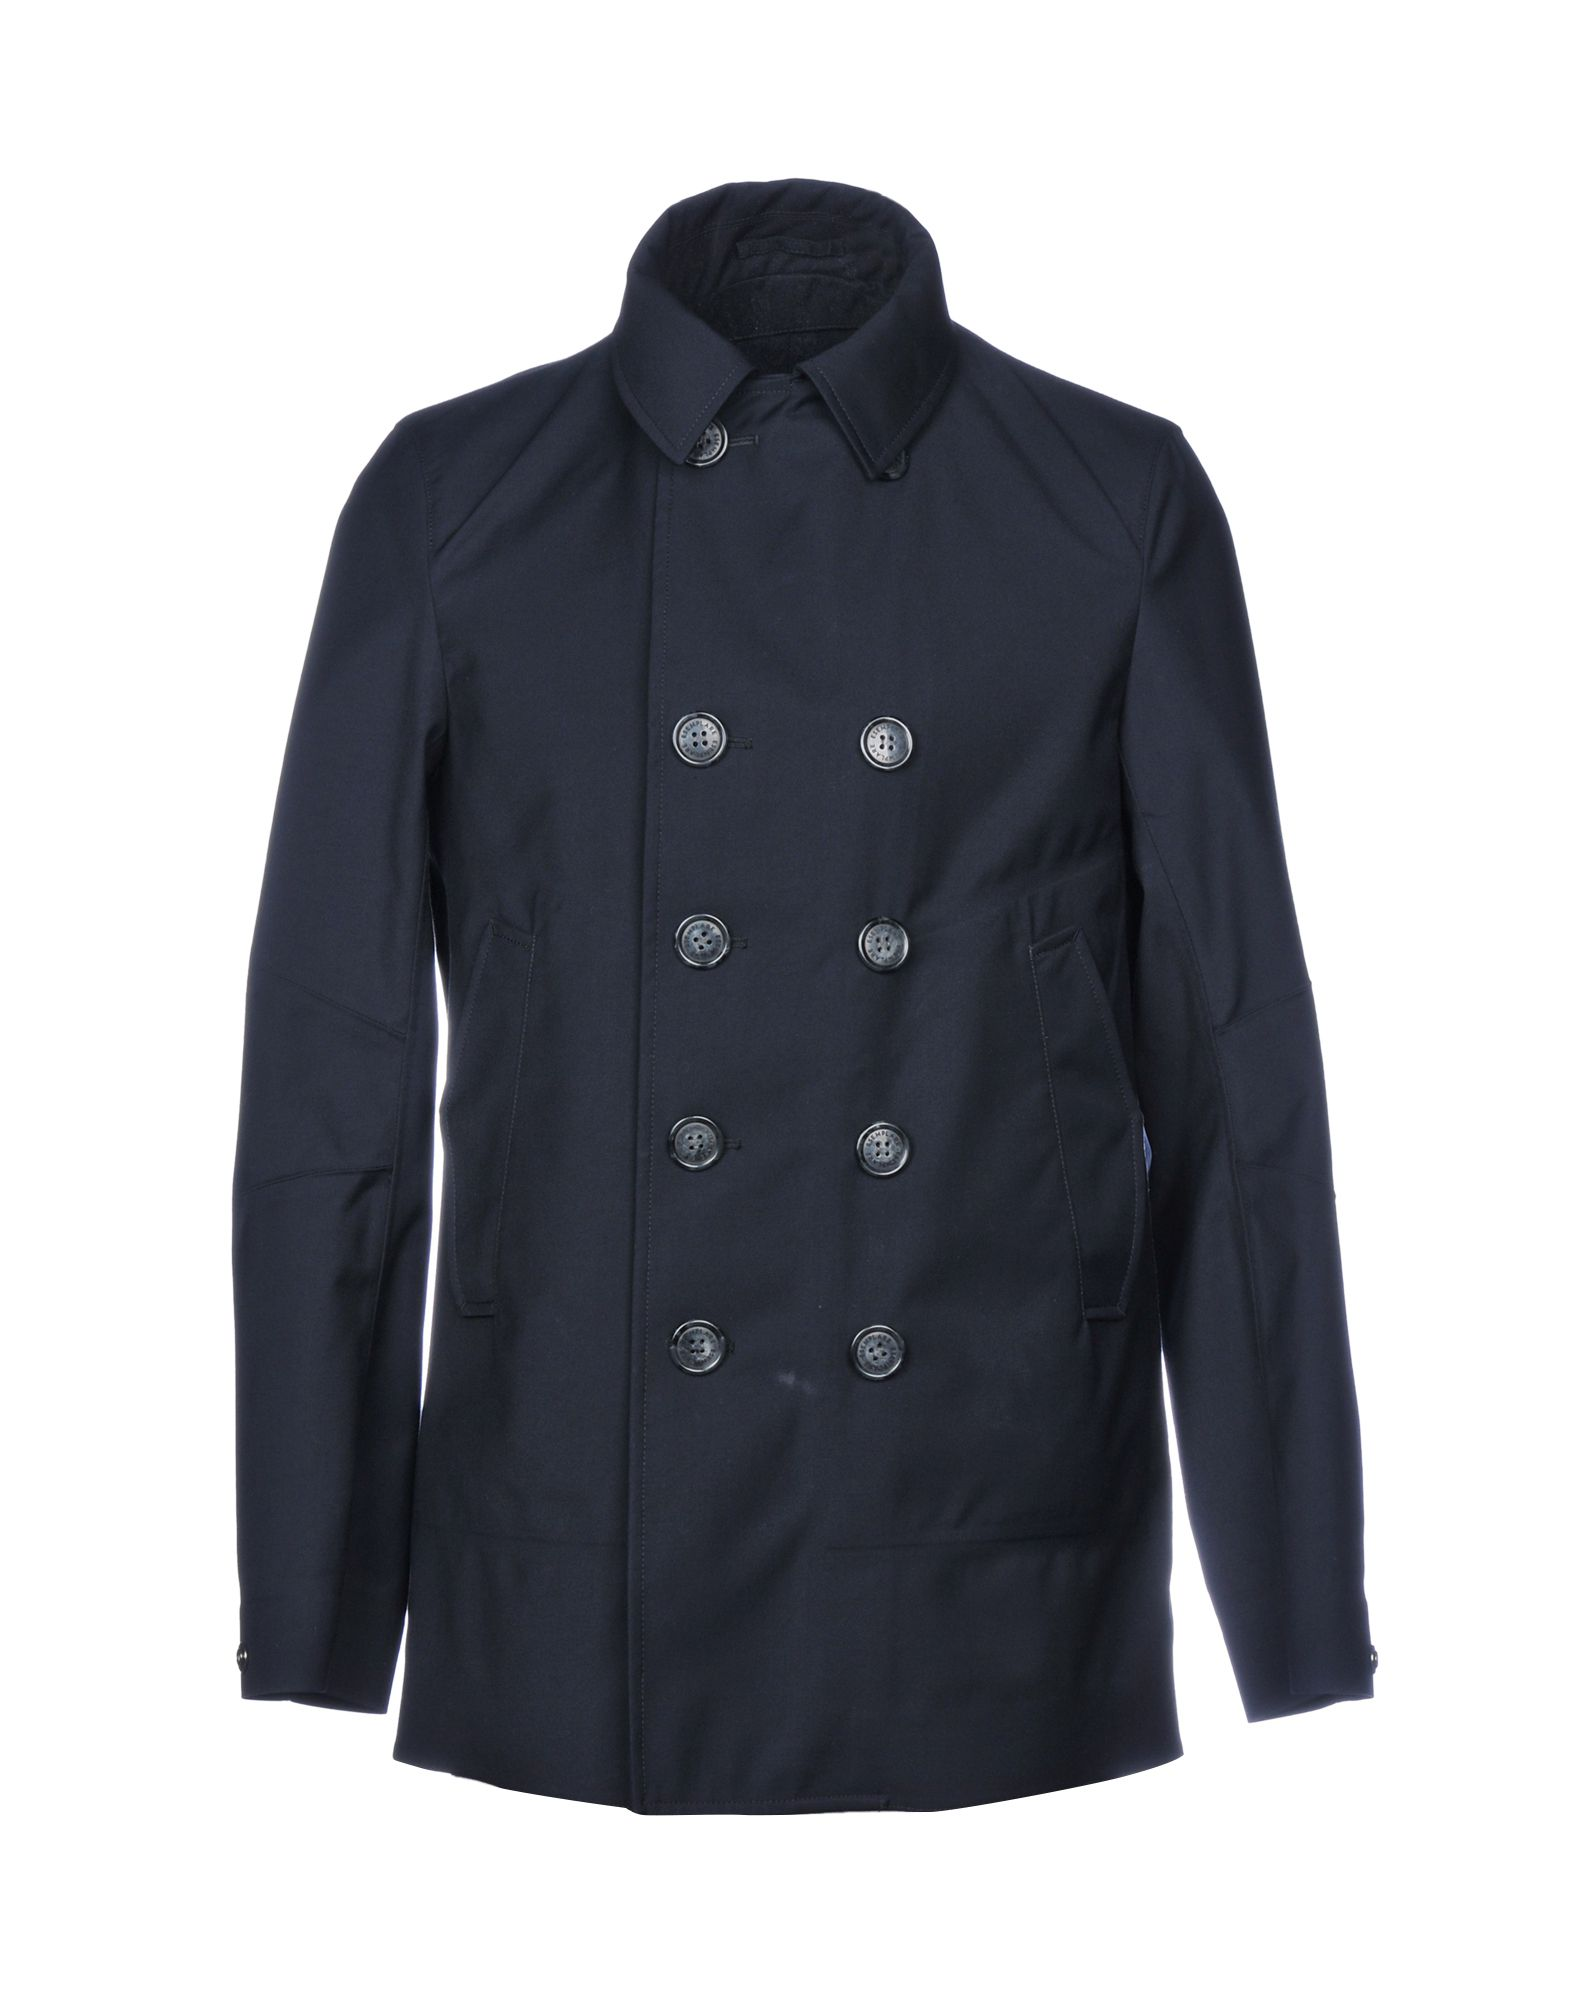 ESEMPLARE Double Breasted Pea Coat in Dark Blue